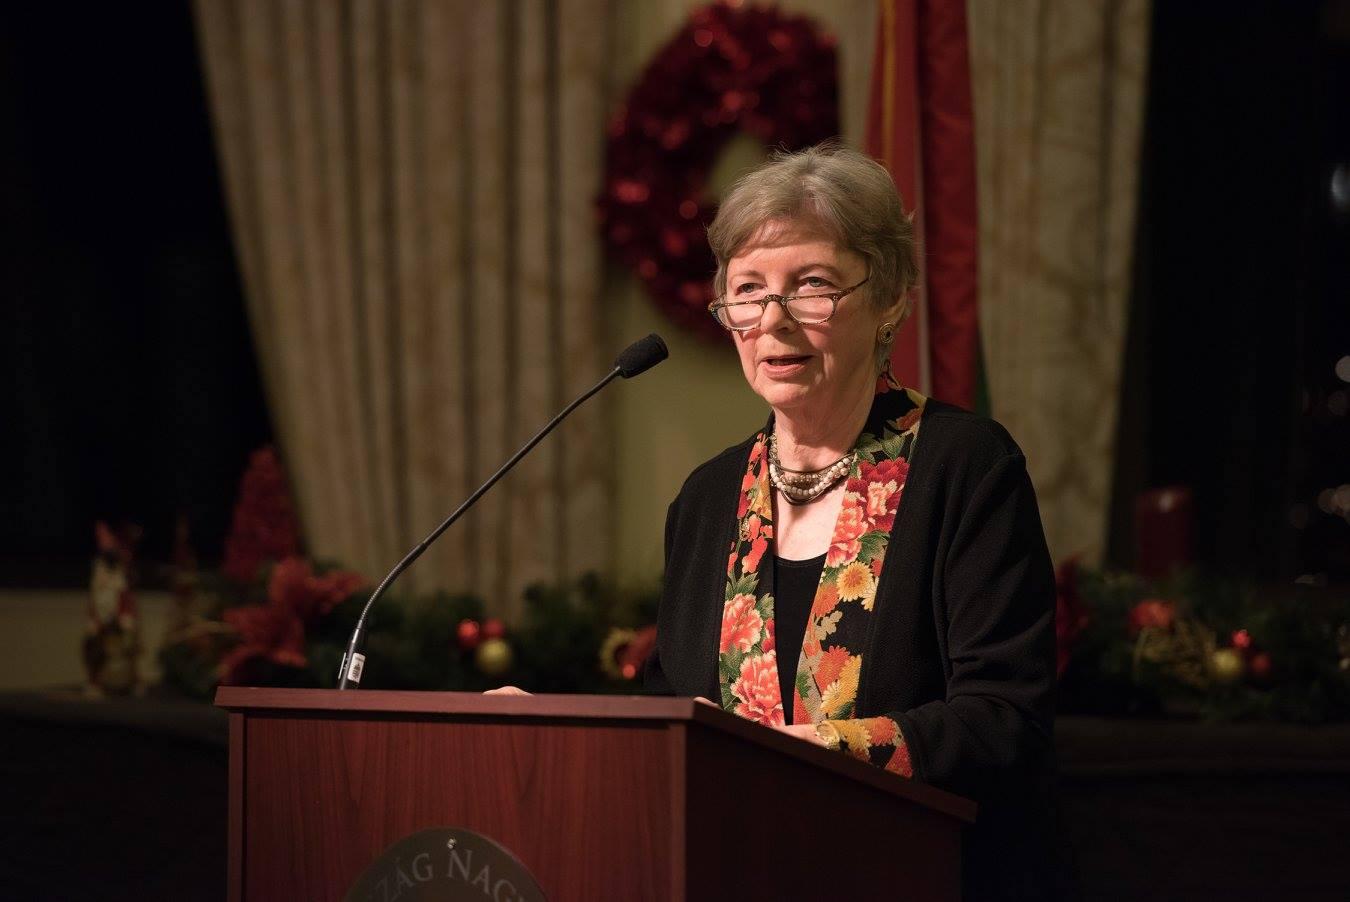 Coalition Chair Emerita Mrs. Edith K. Lauer